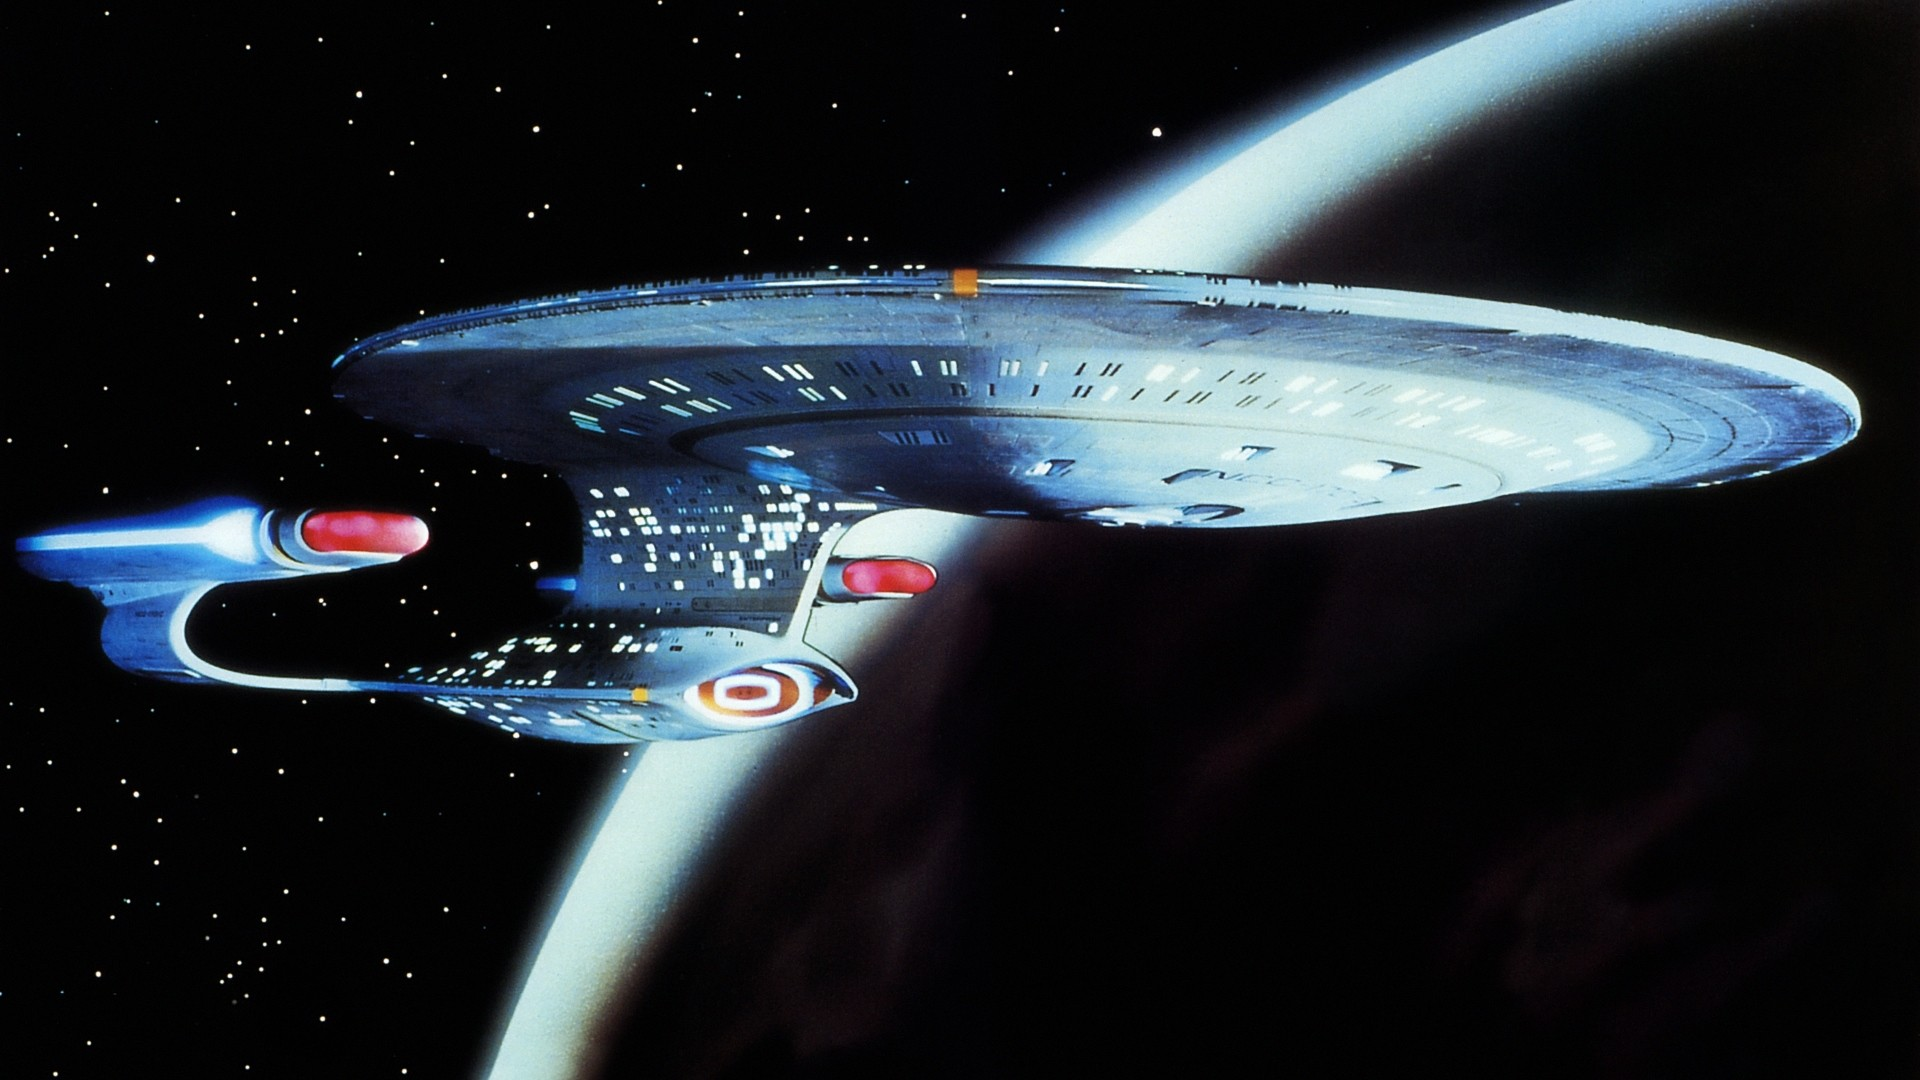 Star Trek Wallpaper and Background